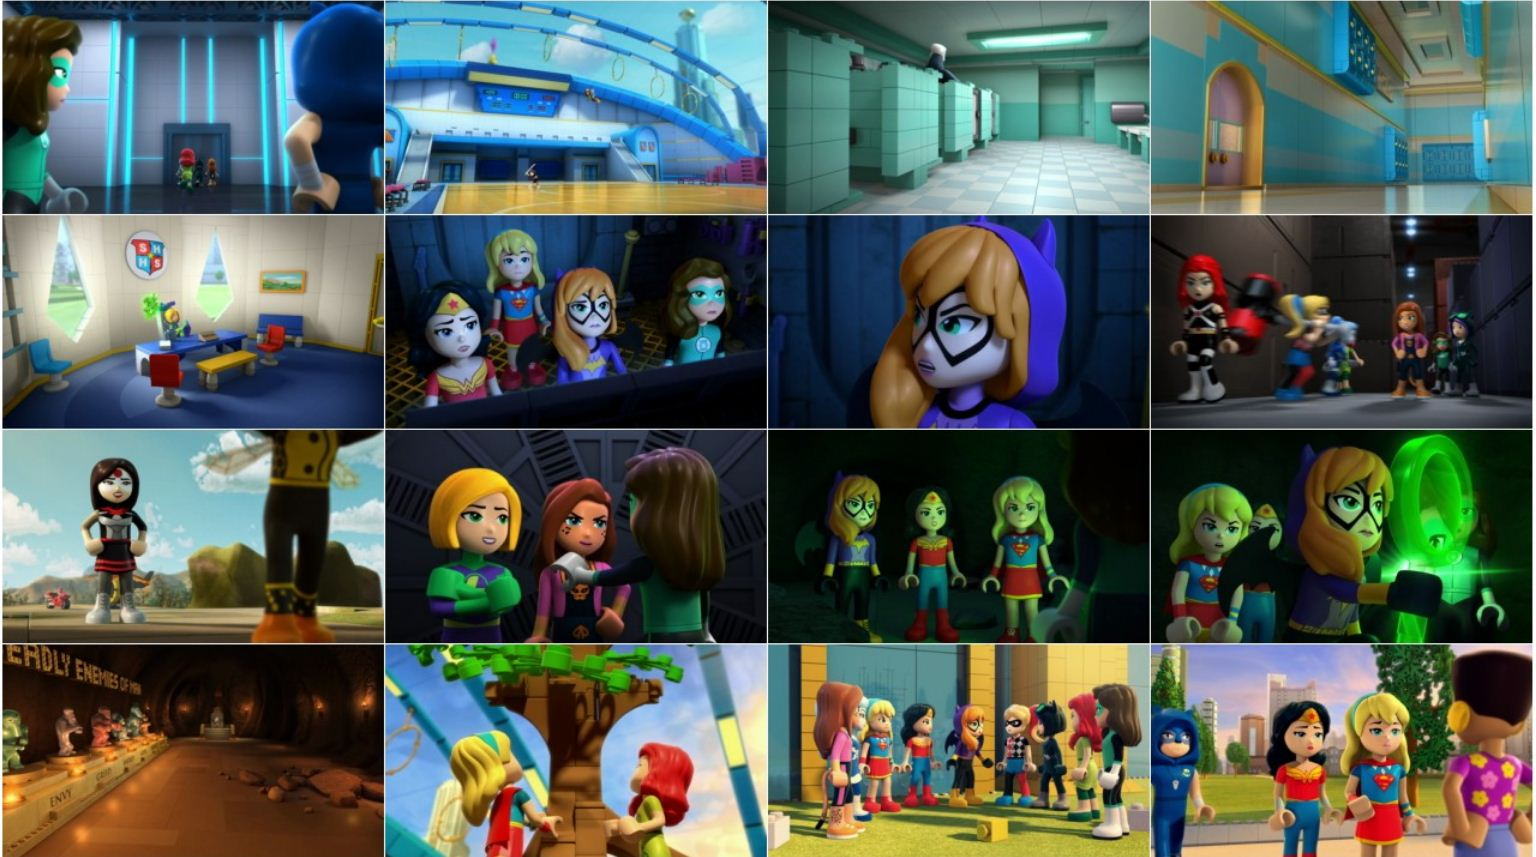 Lego DC Super Hero Girls Super Villain High دانلود انیمیشن Super Hero Girls: Super Villain High 2018